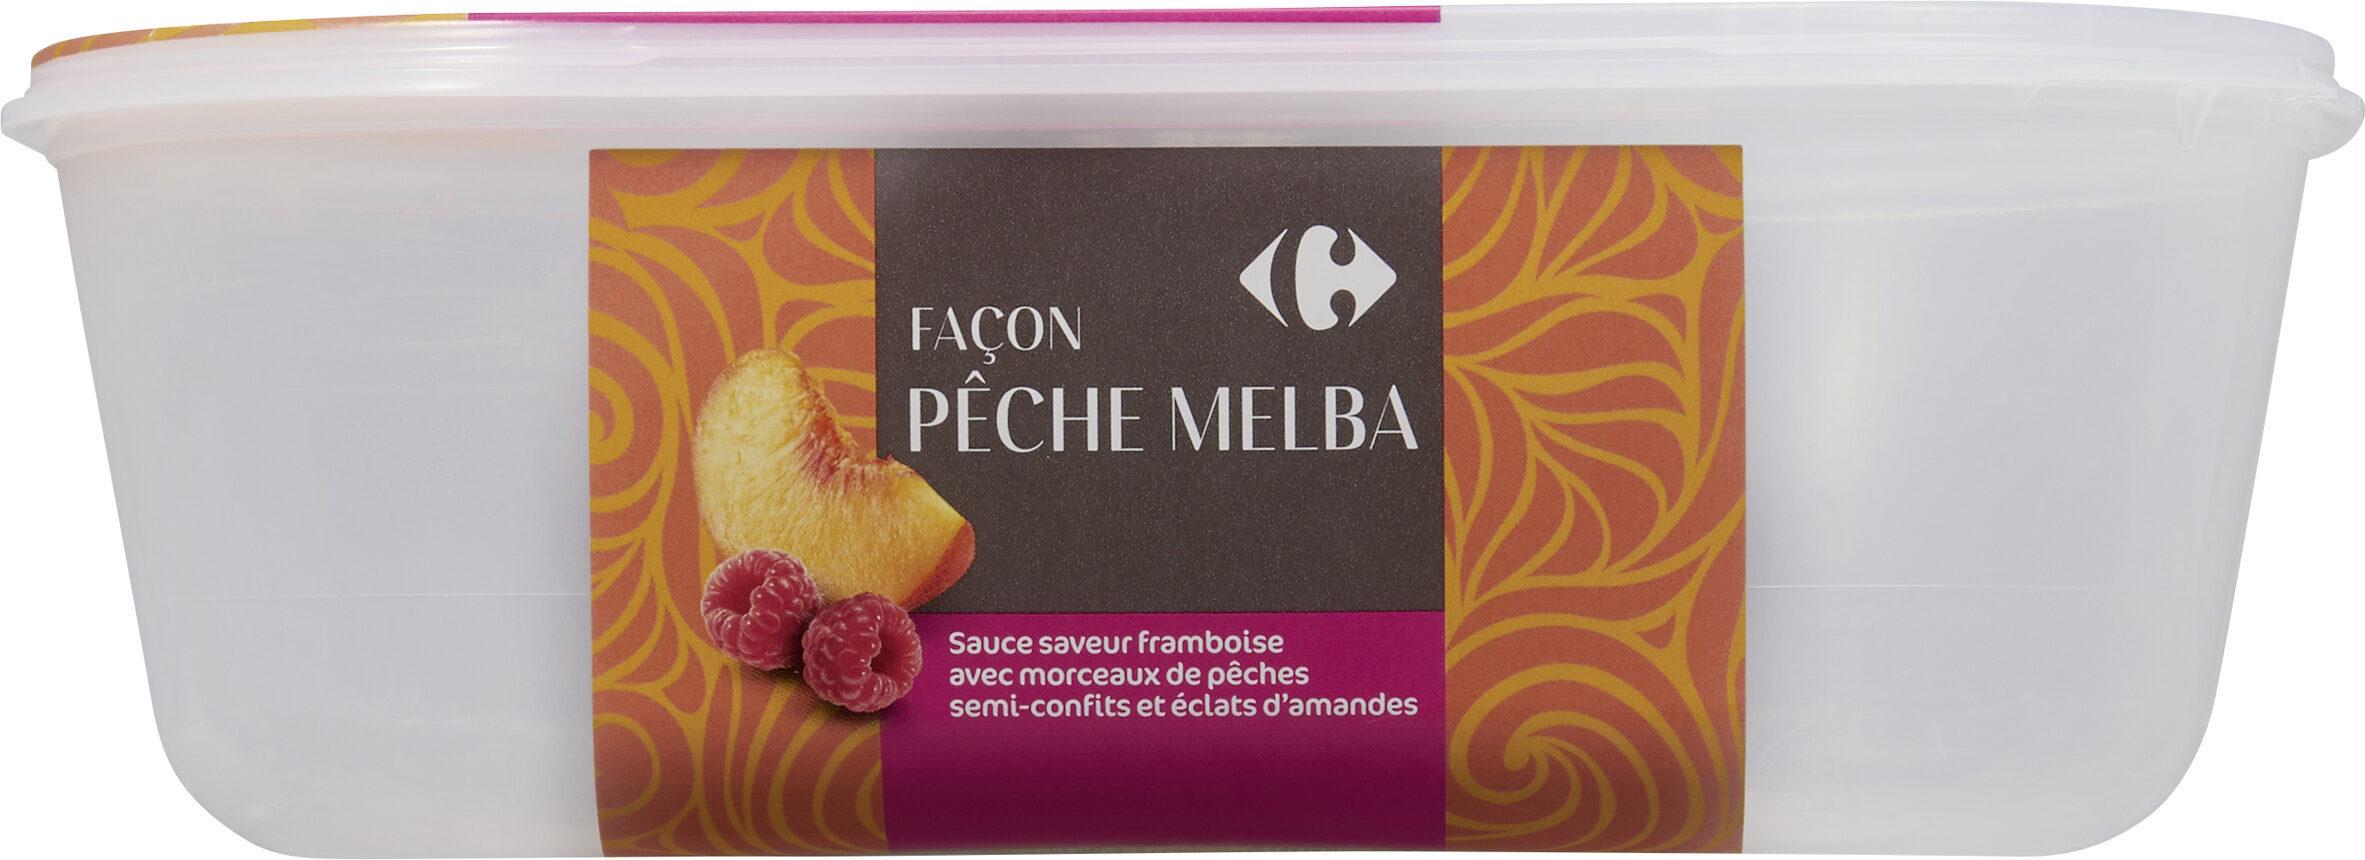 Glace façon pêche melba - Produit - fr